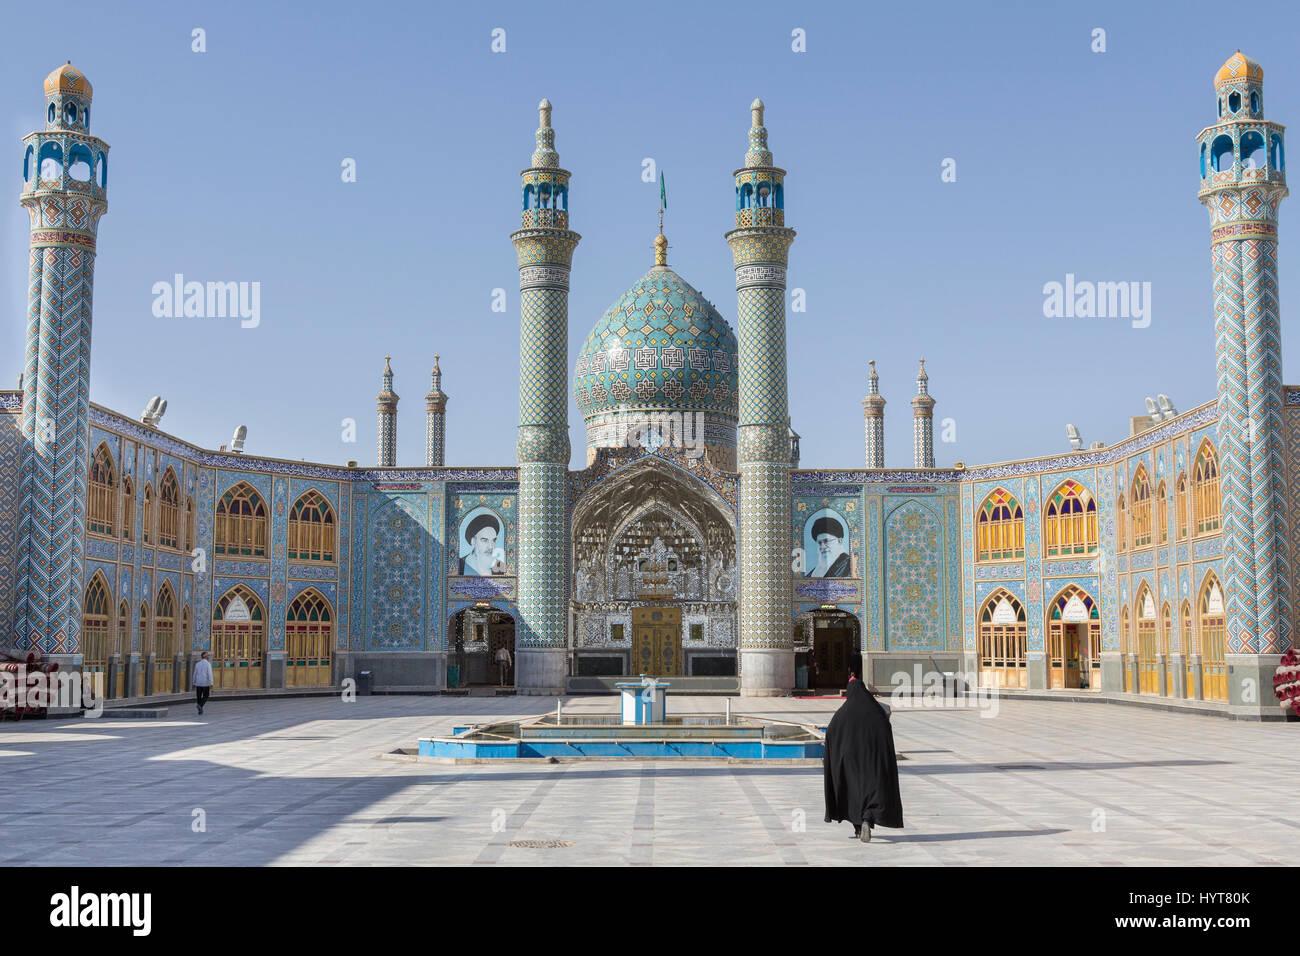 Aran va bidgol Mosque/holy shrine near Kashan, Iran, with a veiled woman walking in front of it   Aran va Bidgol - Stock Image